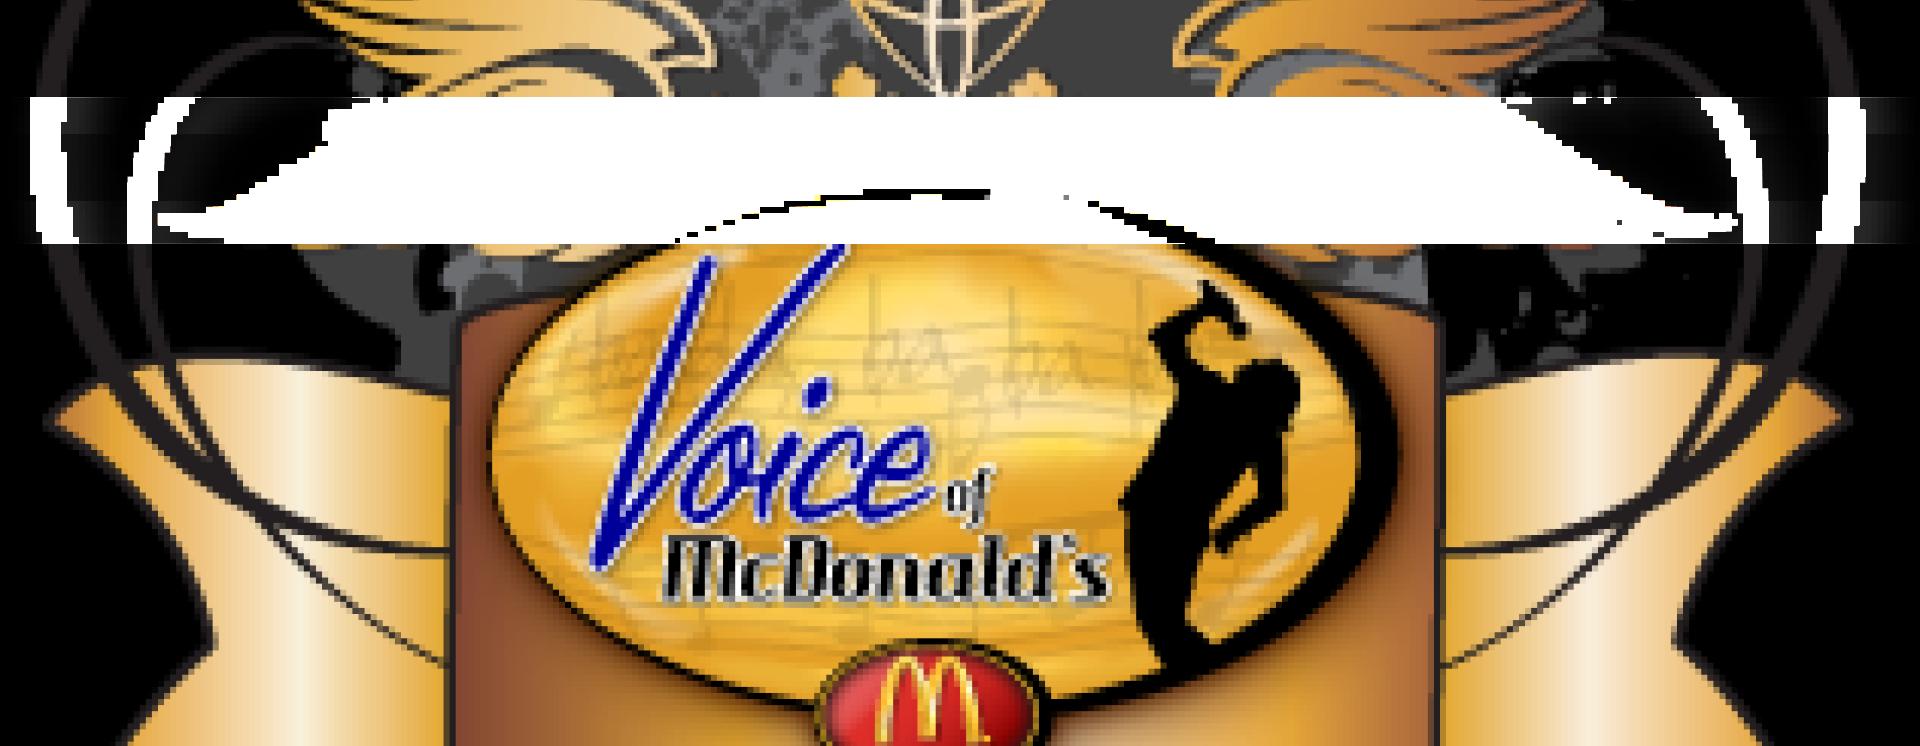 1359431990 logo copy